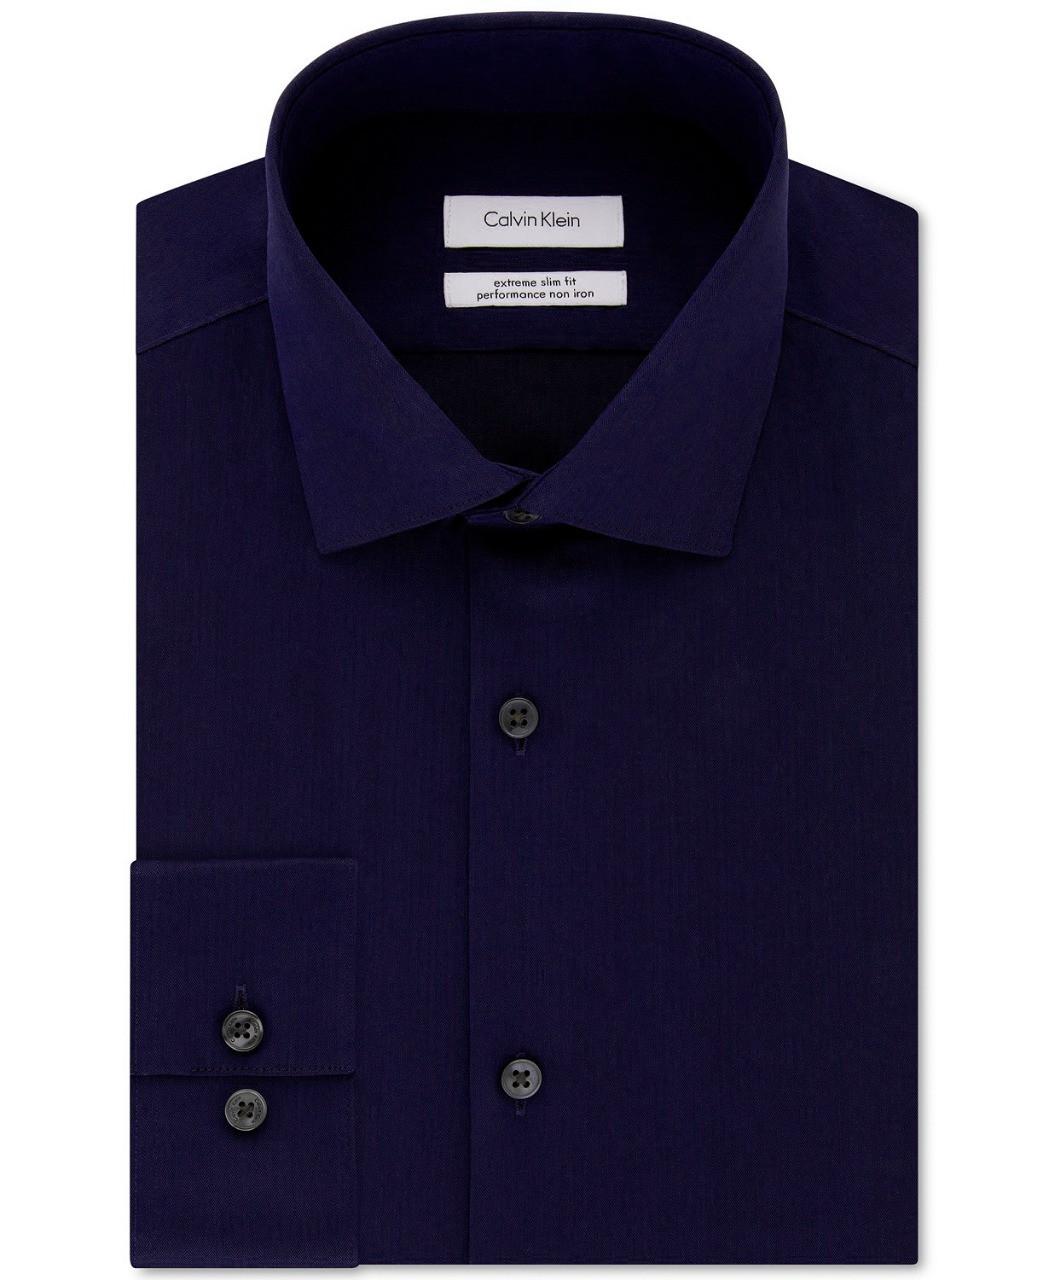 Calvin Klein Рубашка мужская 2000000342597 - фото 1